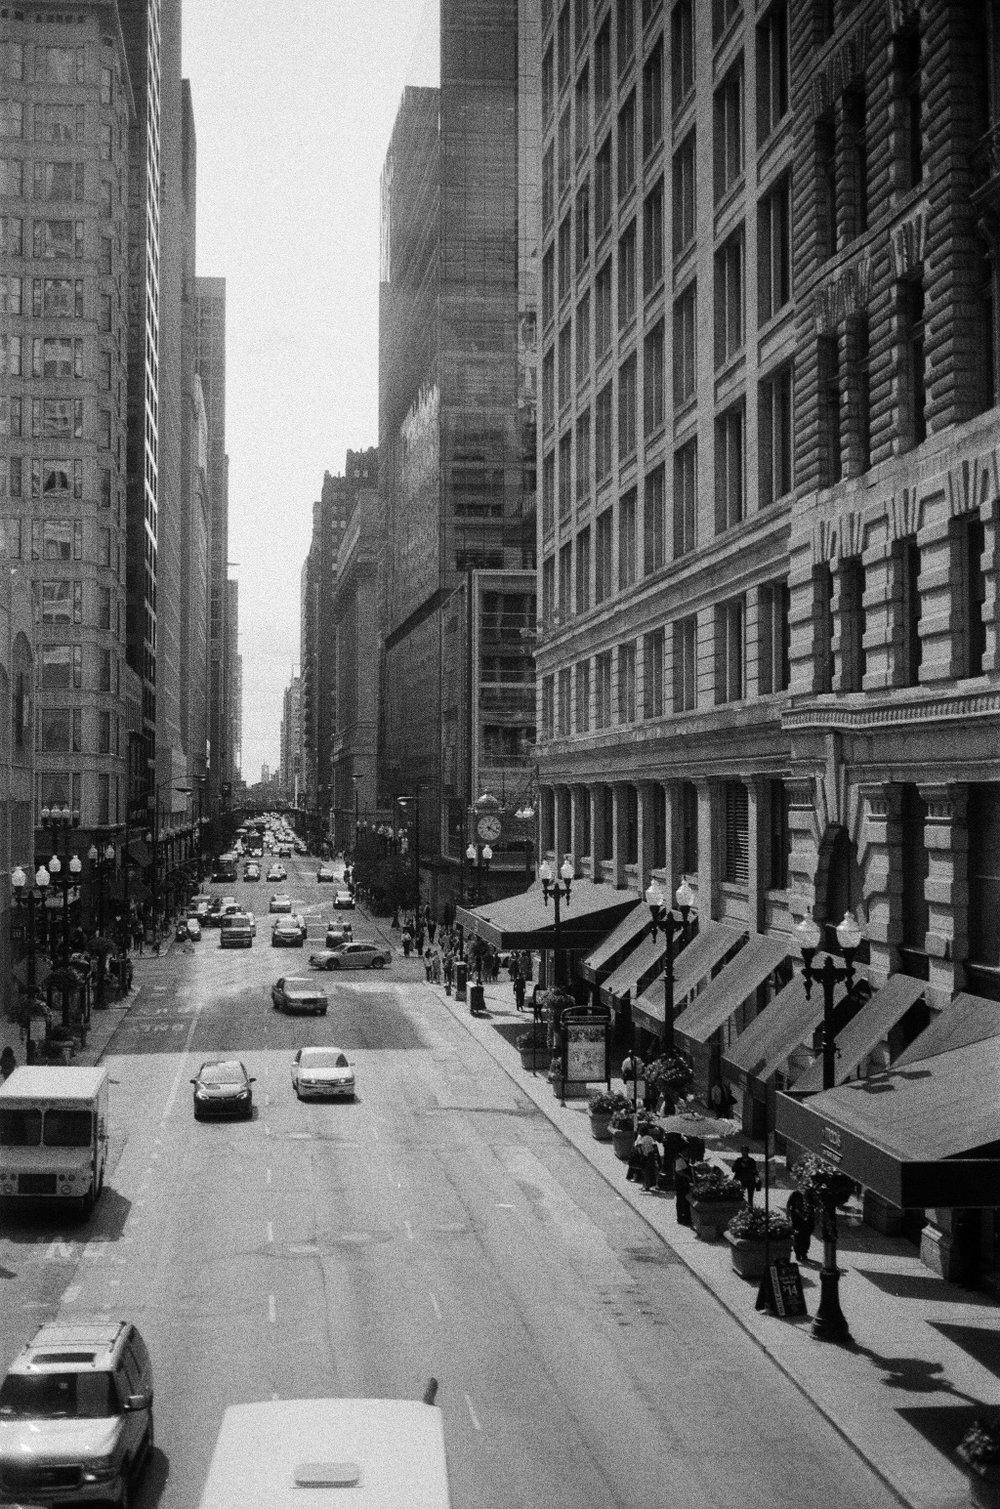 029_ChicagoStreet.jpg